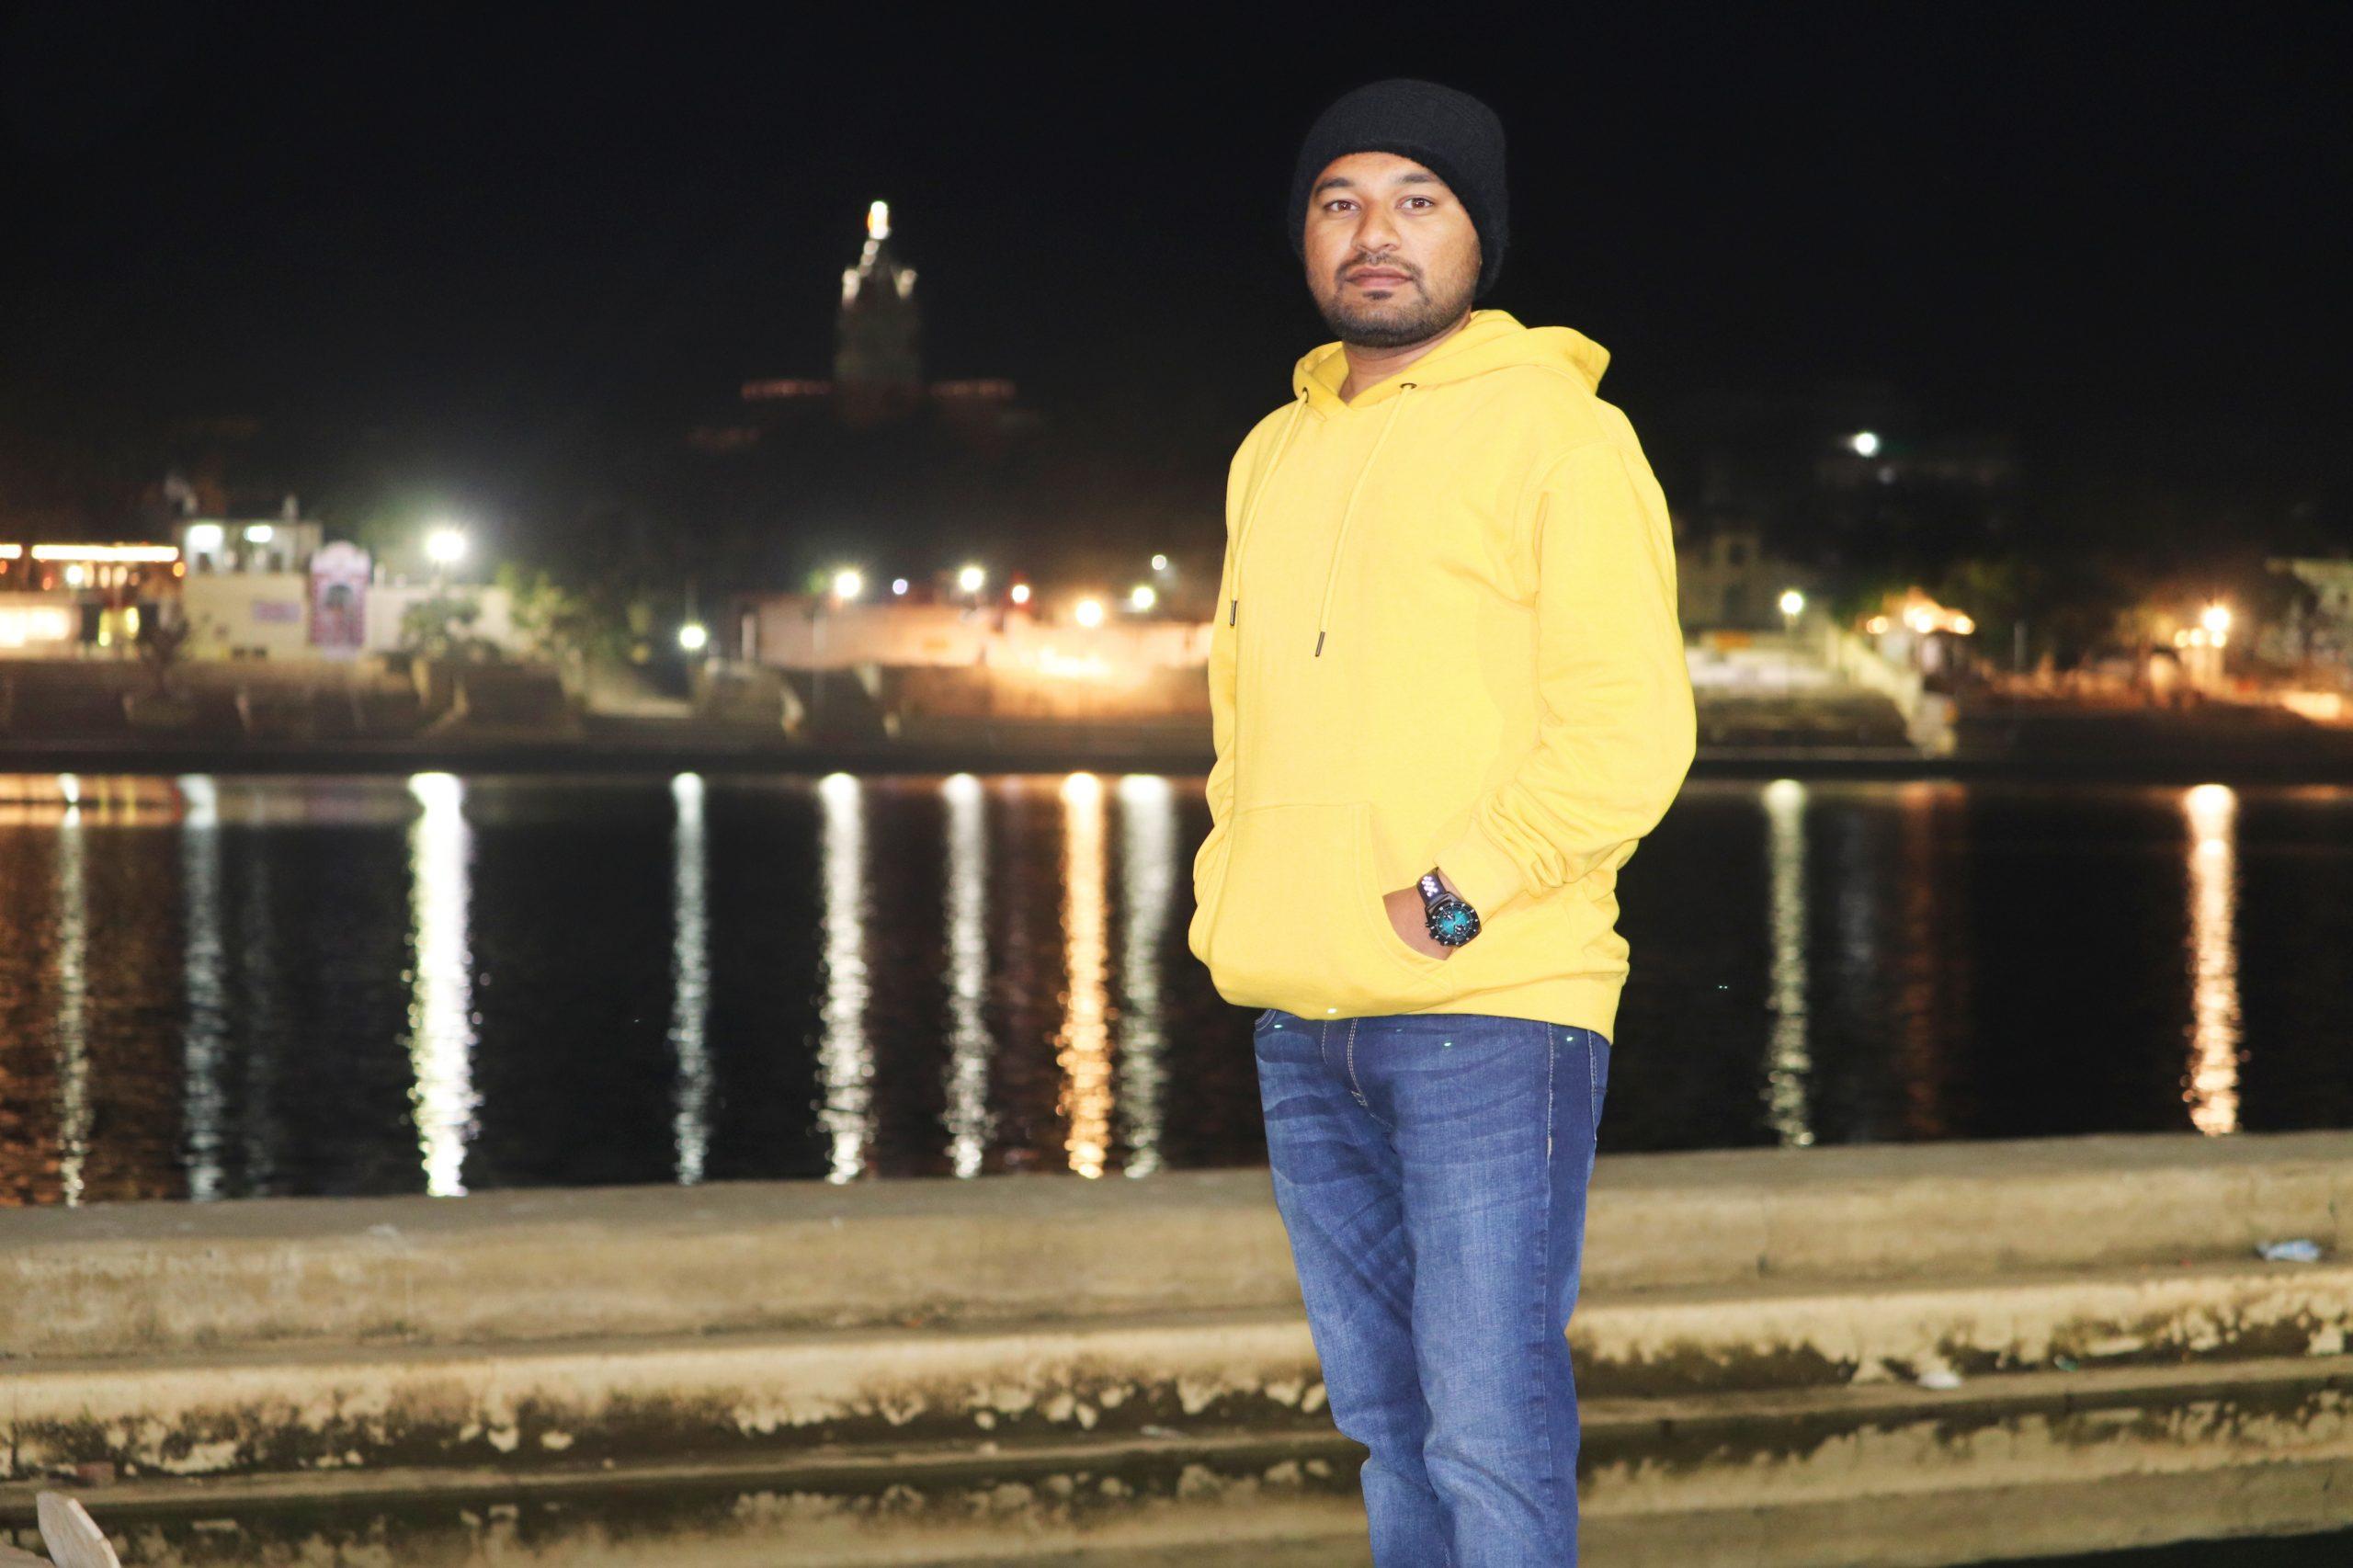 Boy posing in night light